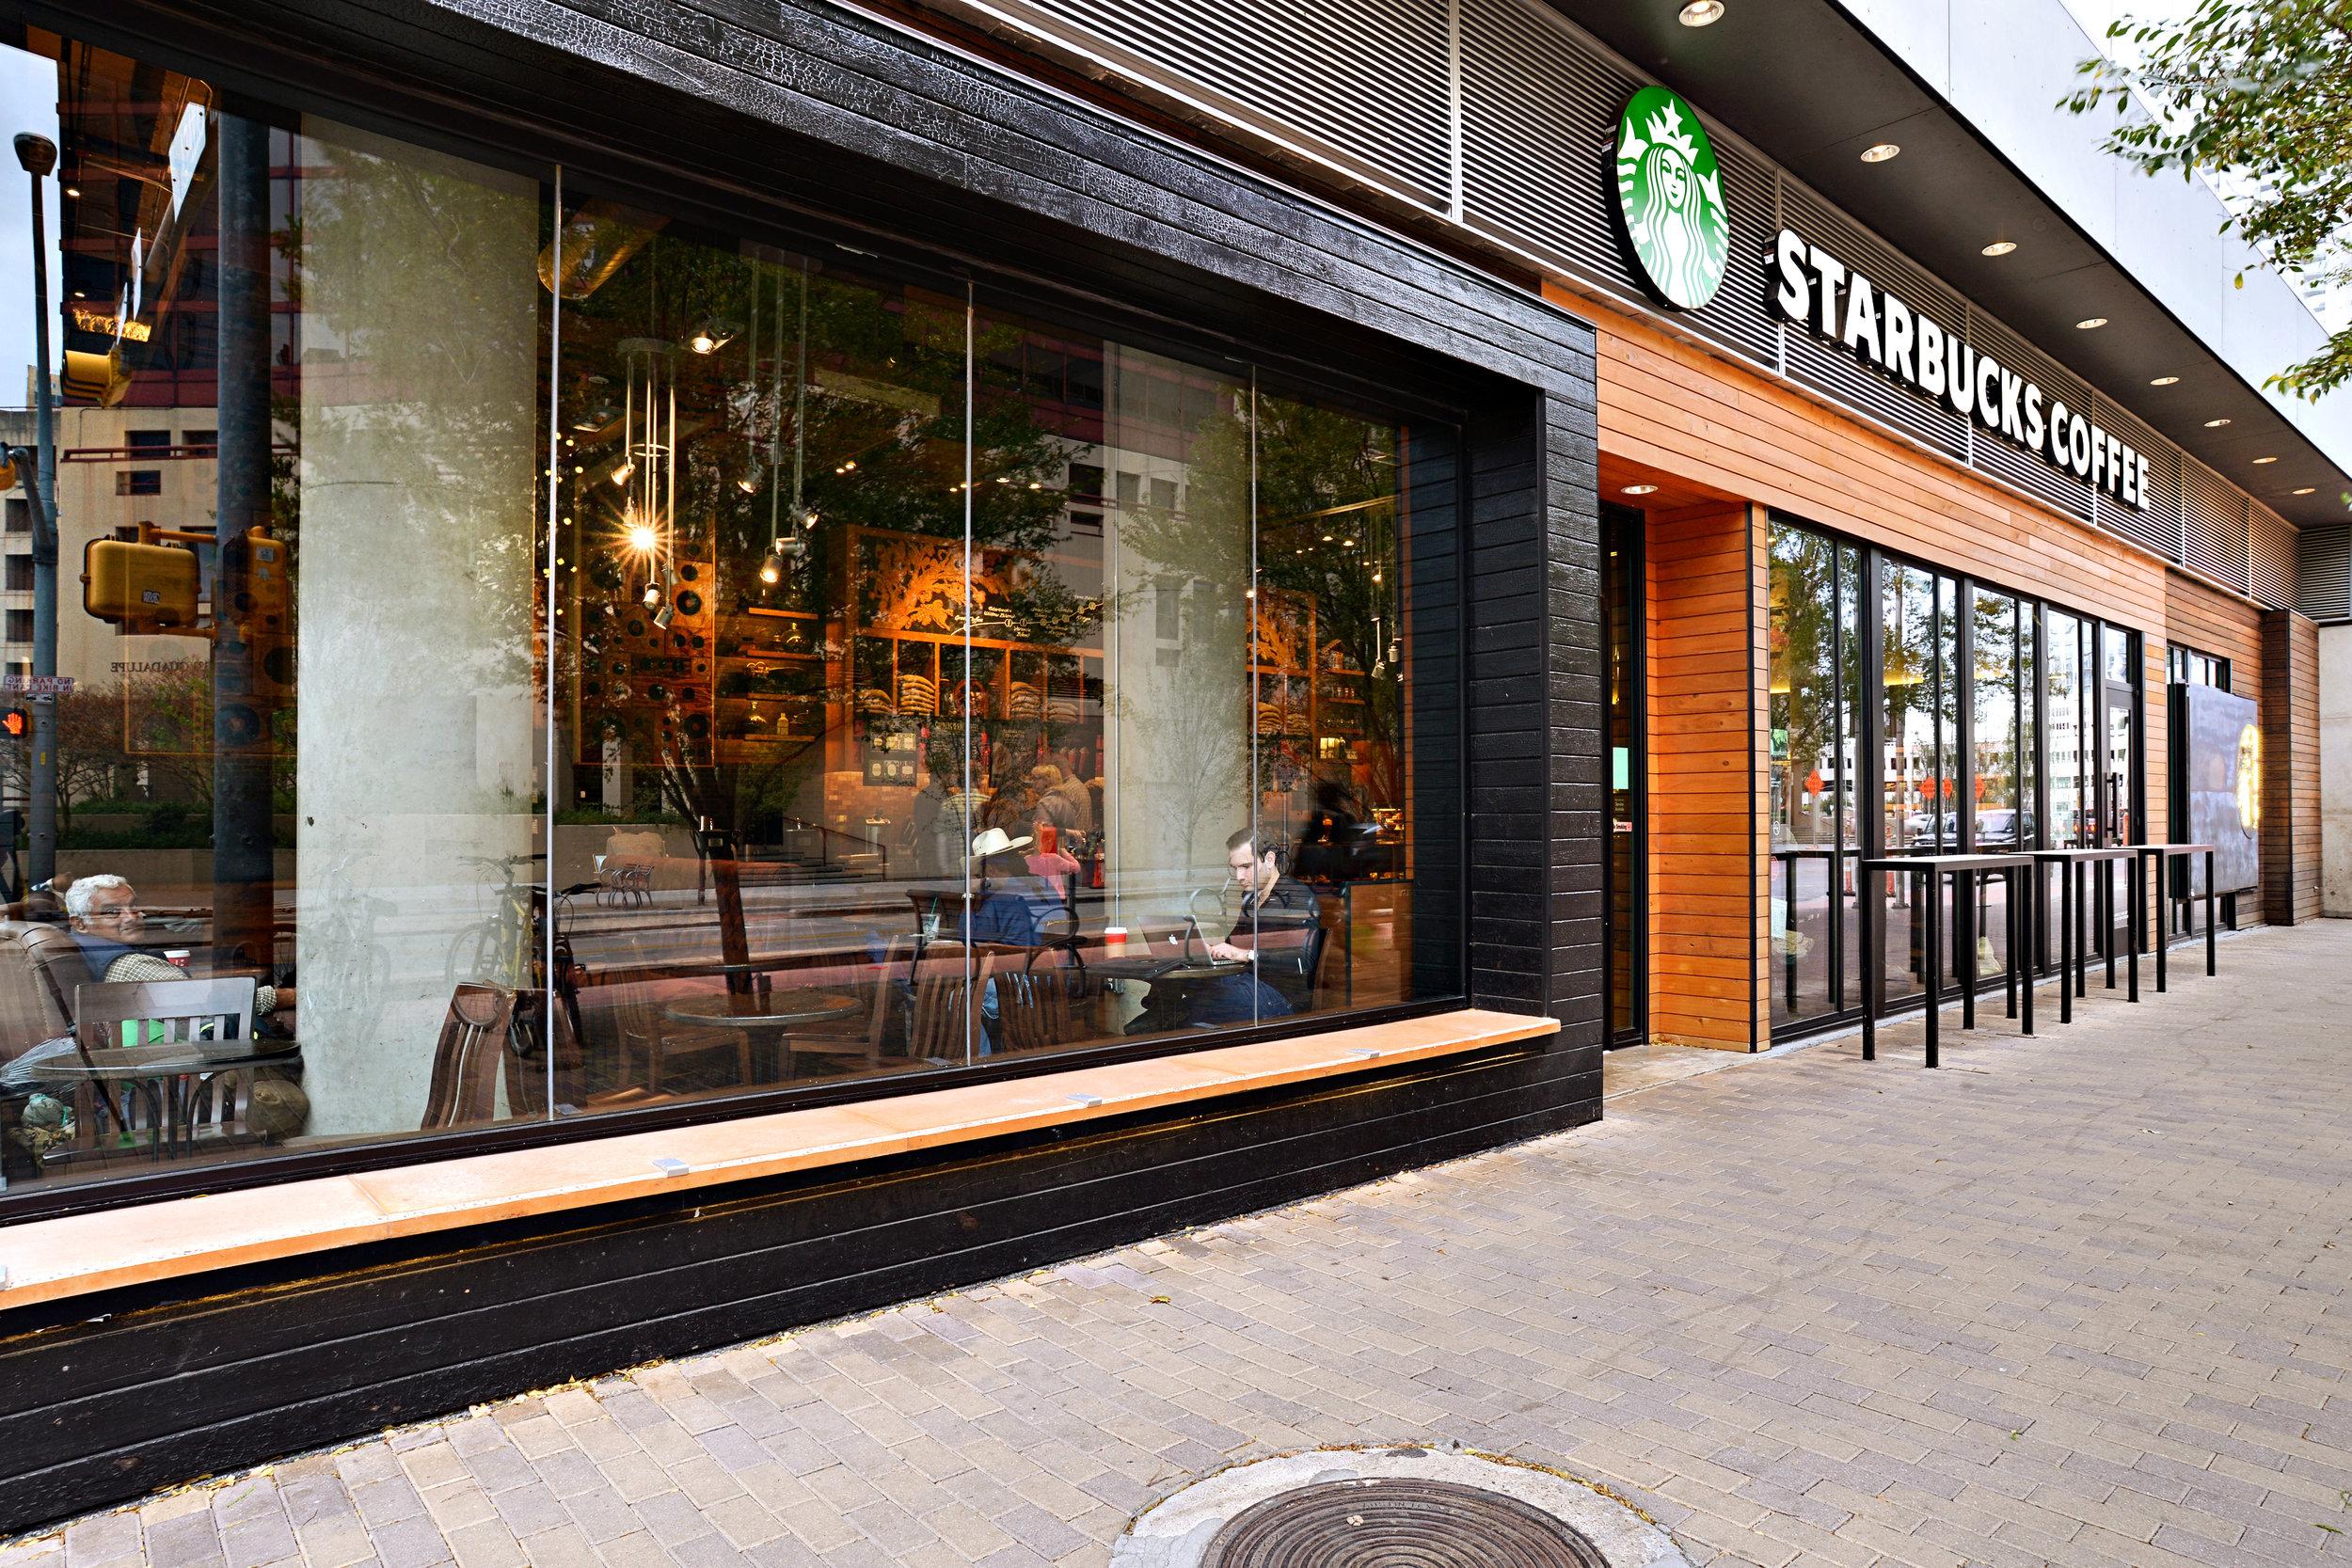 Starkbucks_W_Hotel_003.JPG